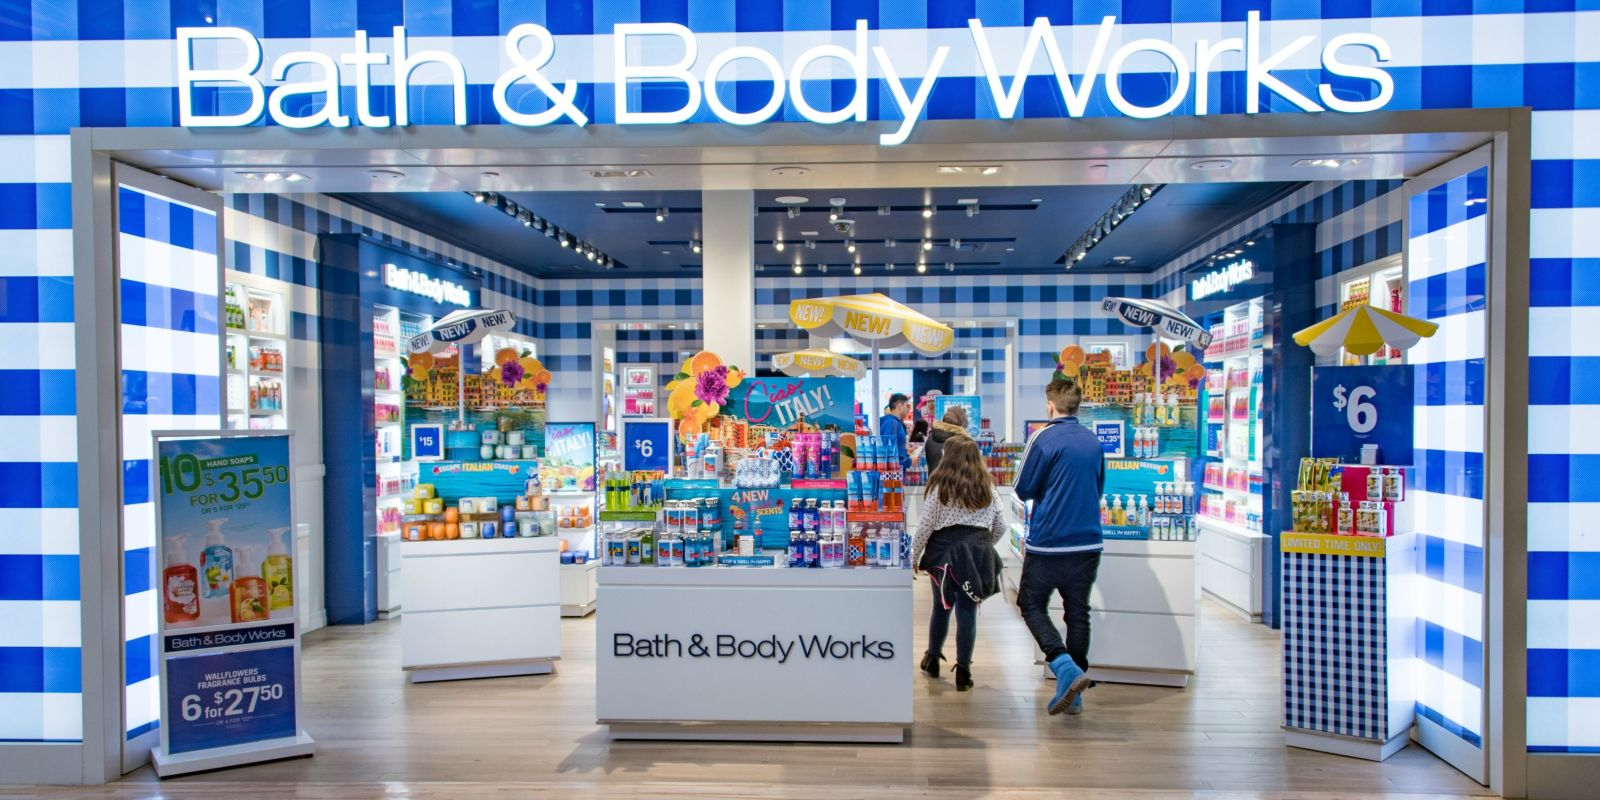 Bath & Body Works Is Bringing Back '90s Flashback Fragrances